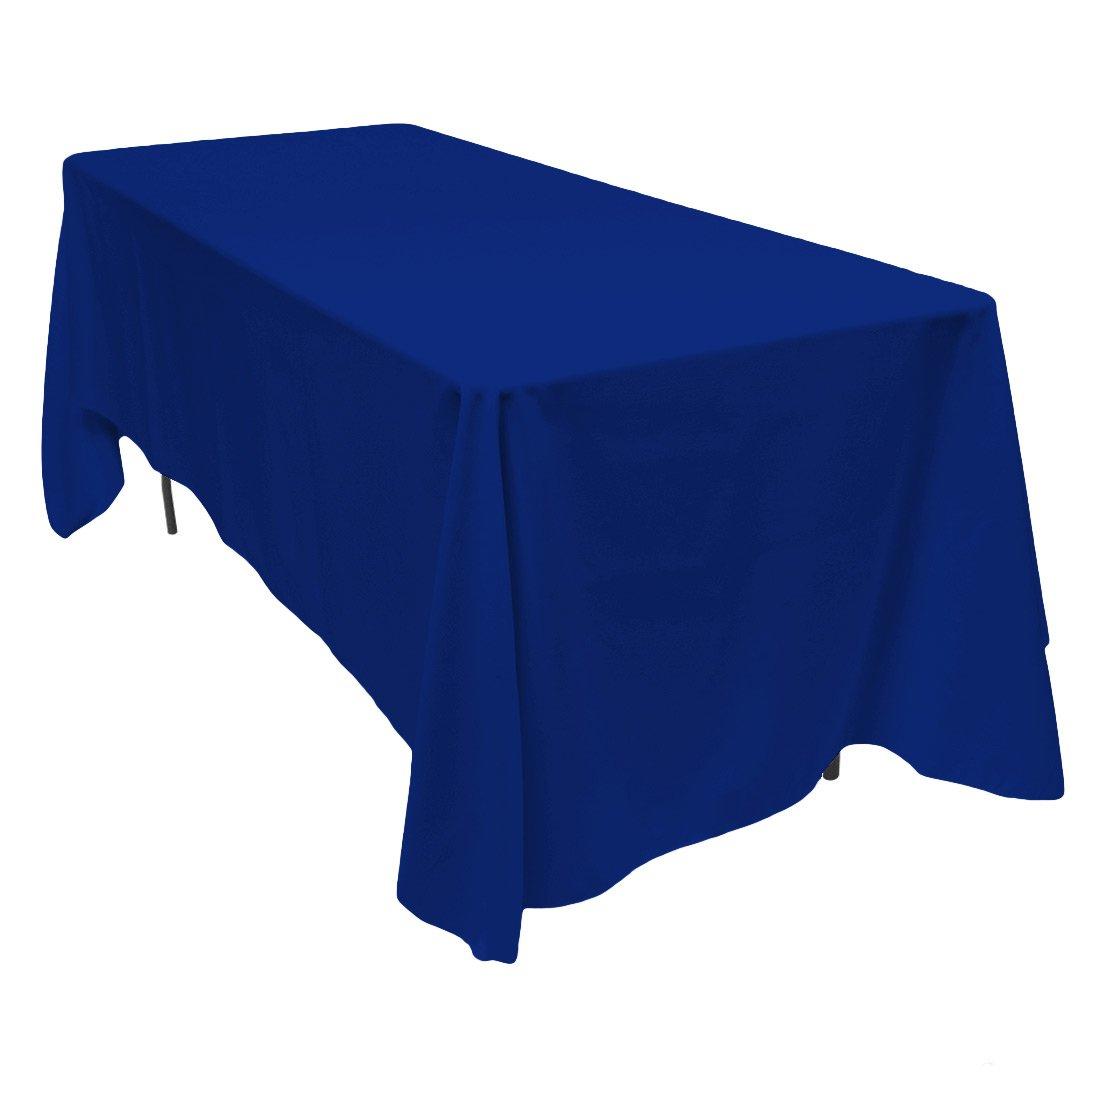 Amazon.com: LinenTablecloth 70 X 120 Inch Rectangular Polyester Tablecloth  Royal Blue: Home U0026 Kitchen